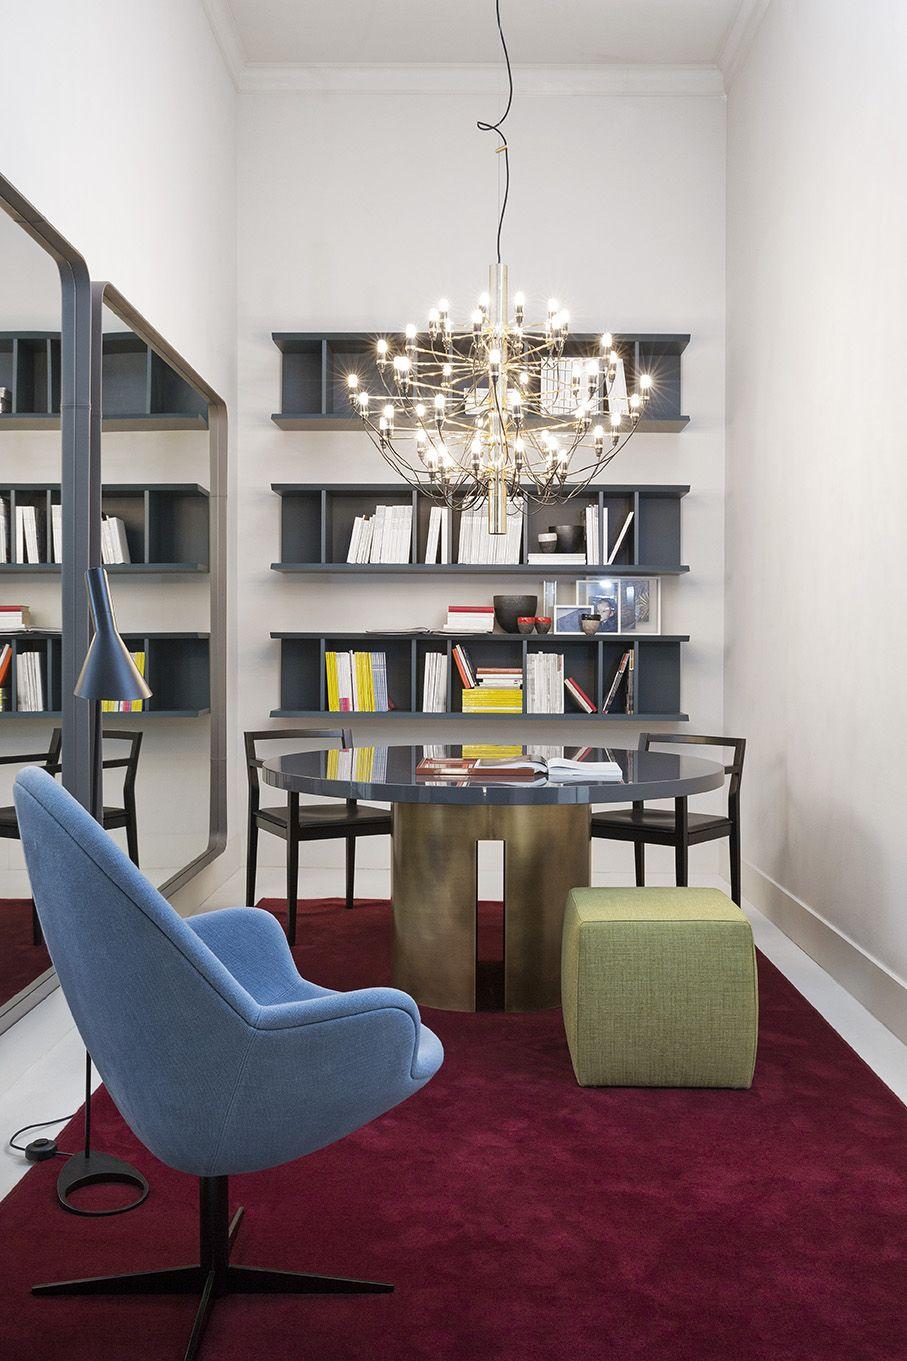 Meridiani I Jill Armchair Gong Dining Table Wilde Chairs Harris Wall Units Birkin Mirrors Charlot Ottoman